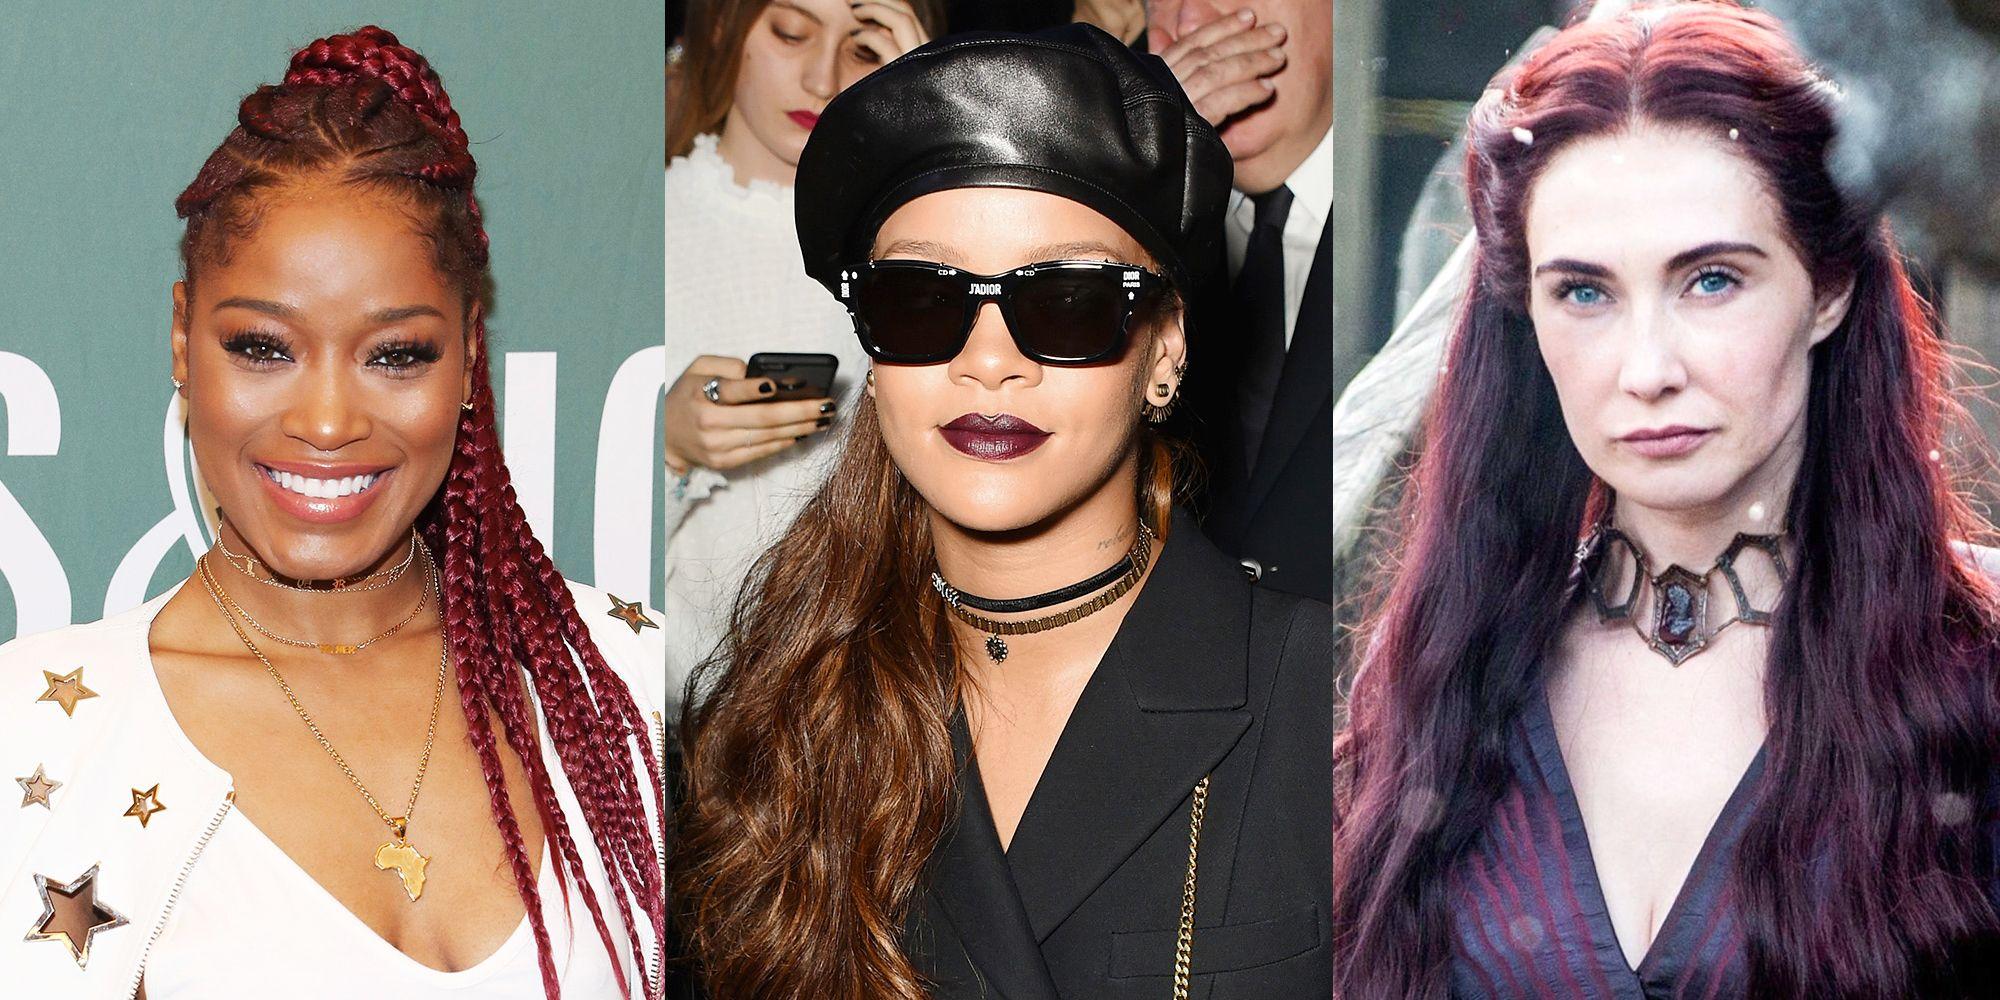 6 Best Fall Hair Colors For 2018 Trendy Autumn Hair Color Ideas